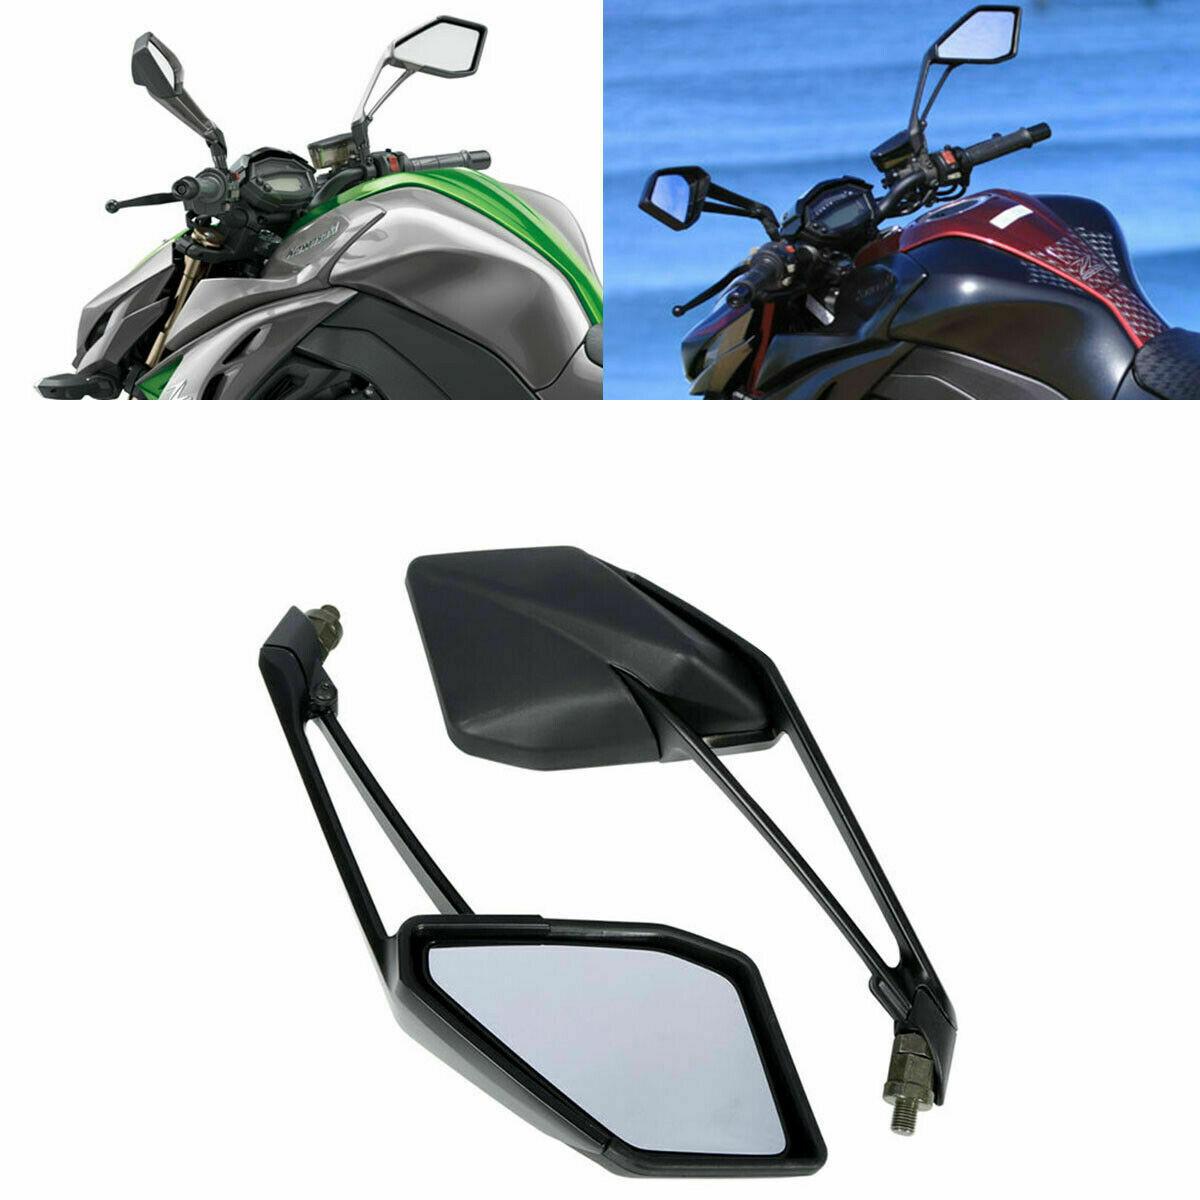 Мотоциклетные зеркала заднего вида для Kawasaki Z1000 Z 1000 2014-2016 2015 Black L & R